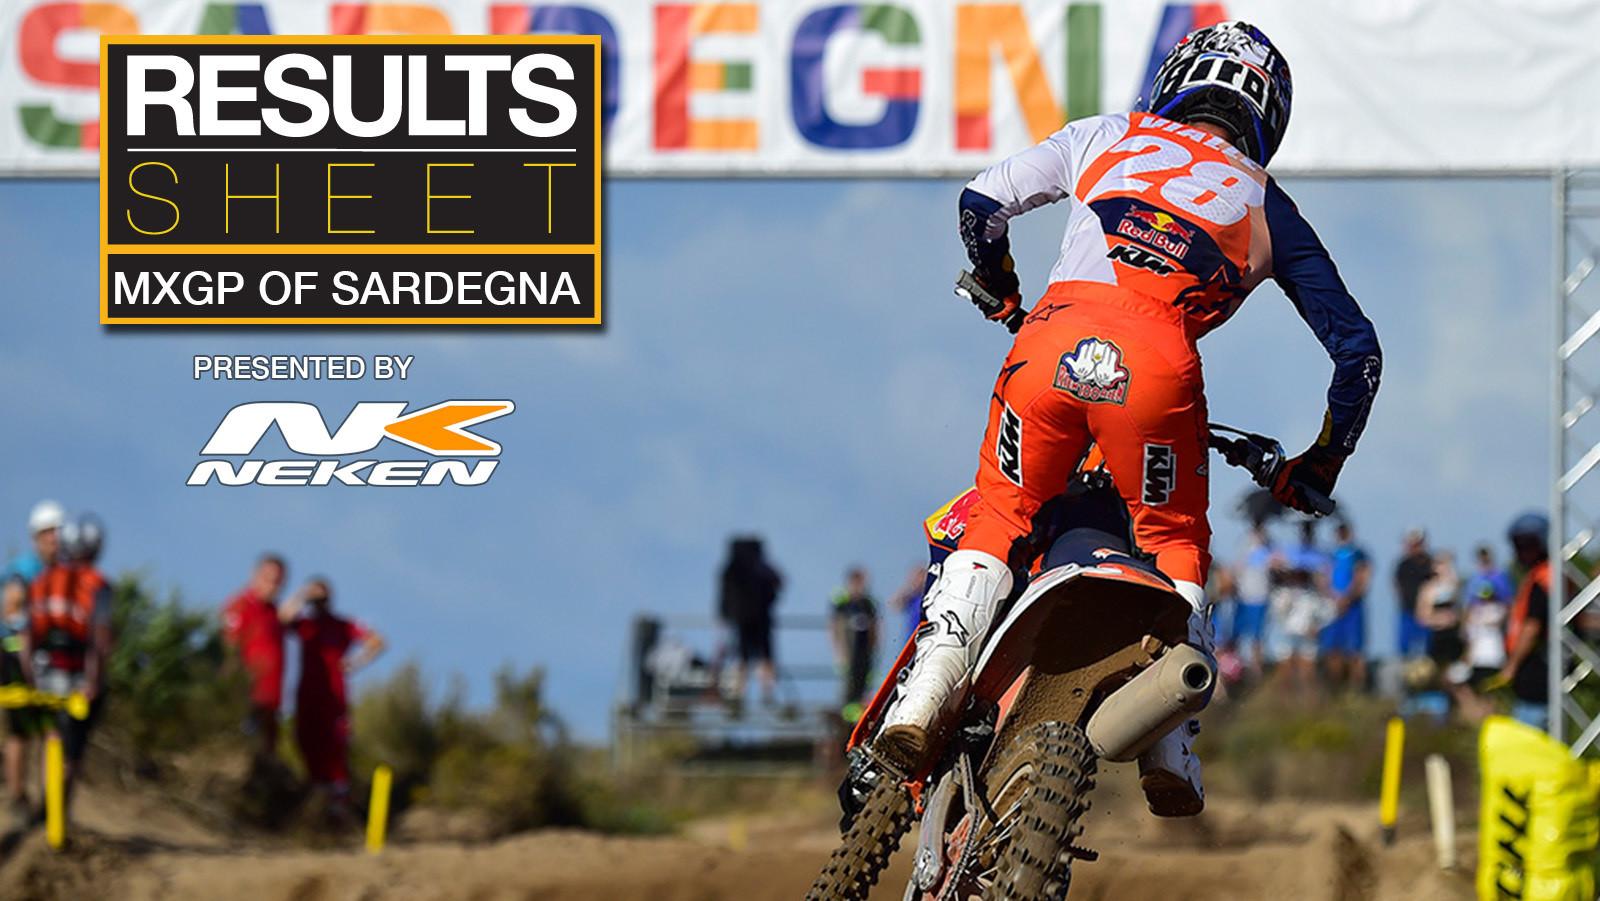 Results Sheet: 2021 MXGP of Sardegna